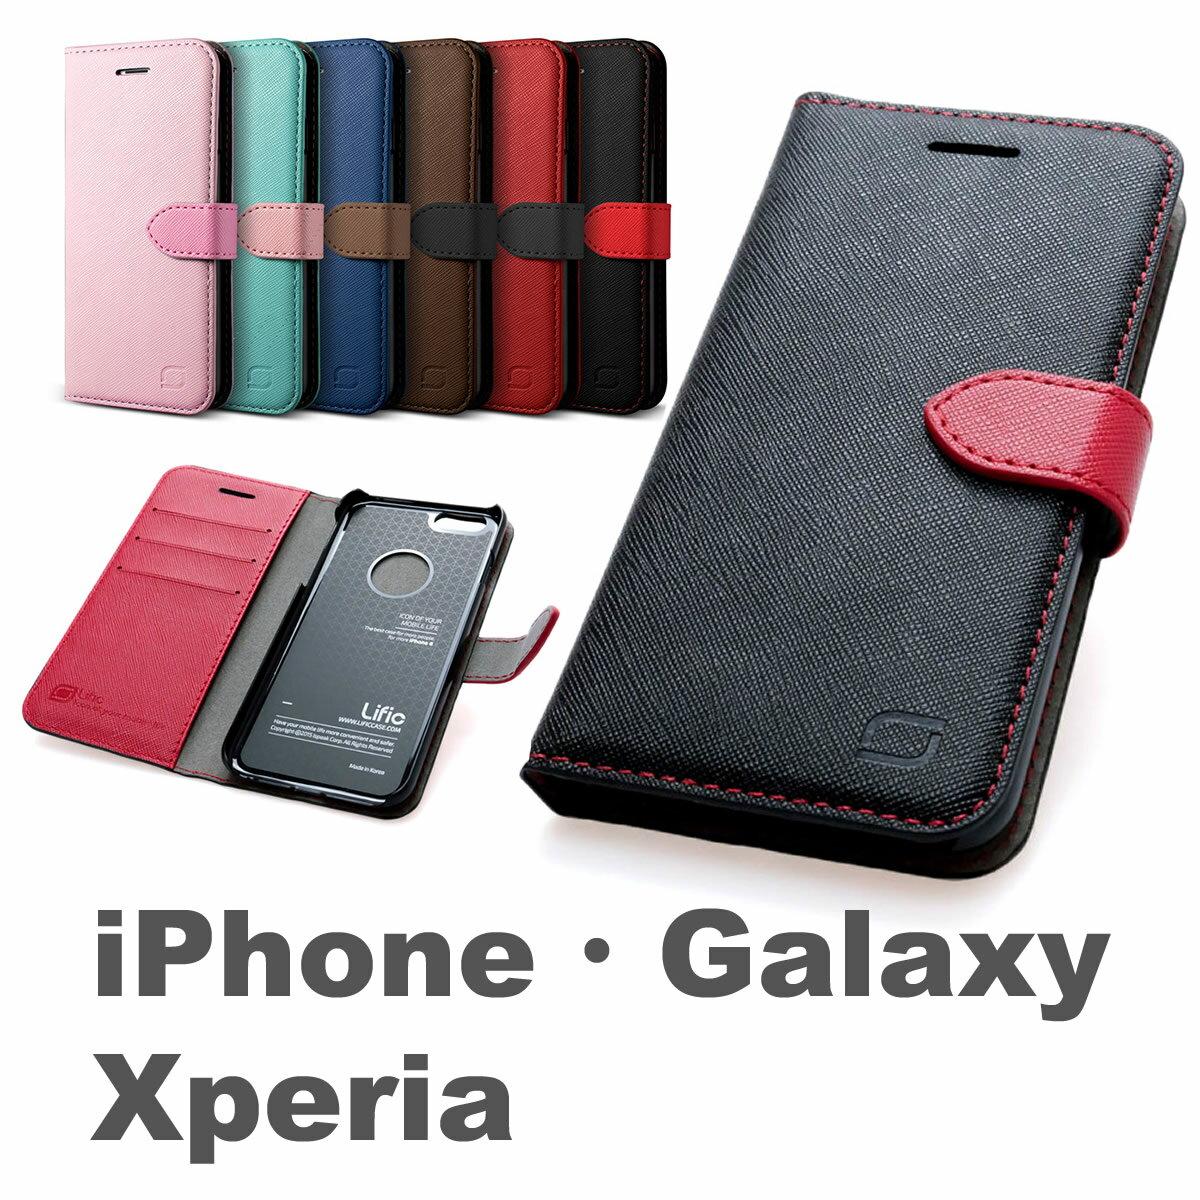 iPhone8 iPhone7 ケース 手帳型 iPhone6 iPhone6S iPhone5S iPhoneSE Plus Galaxy S6 edge S7 edge Xperia X performance 手帳型ケース 手帳 カバー スマホ アイフォン アイホン ギャラクシ